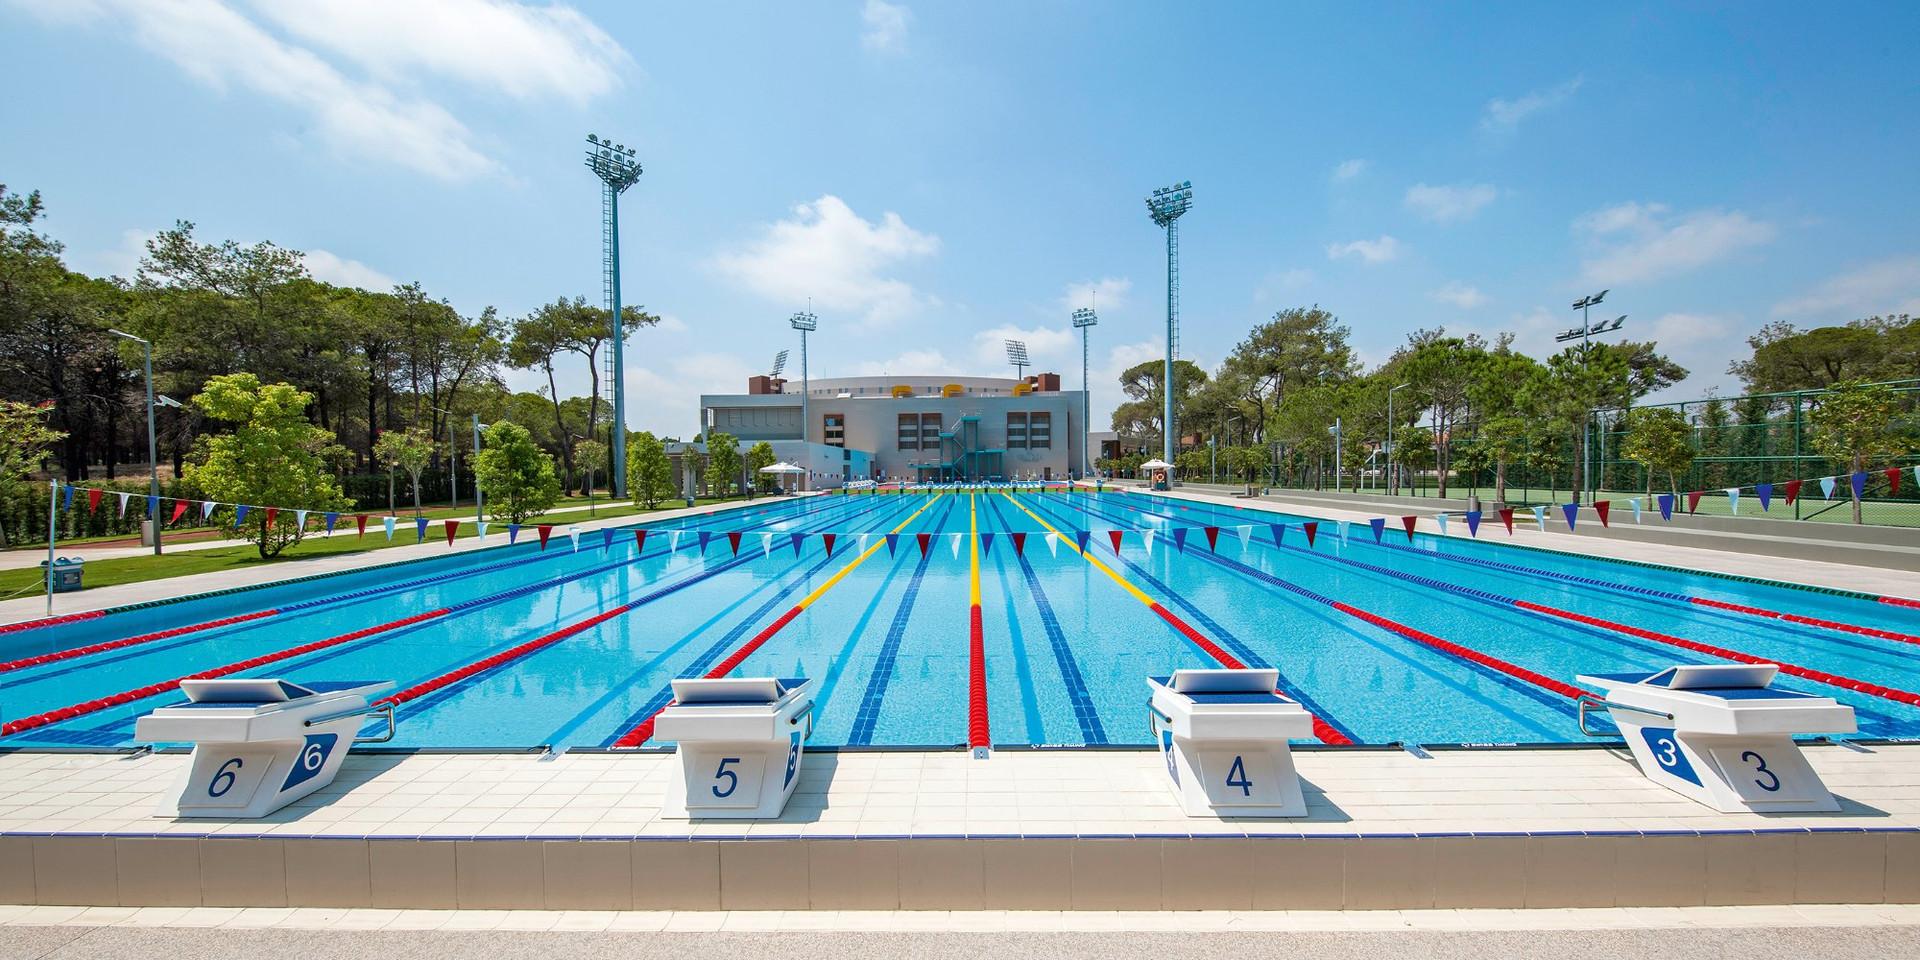 aquatic-sports-facilities (3).jpg